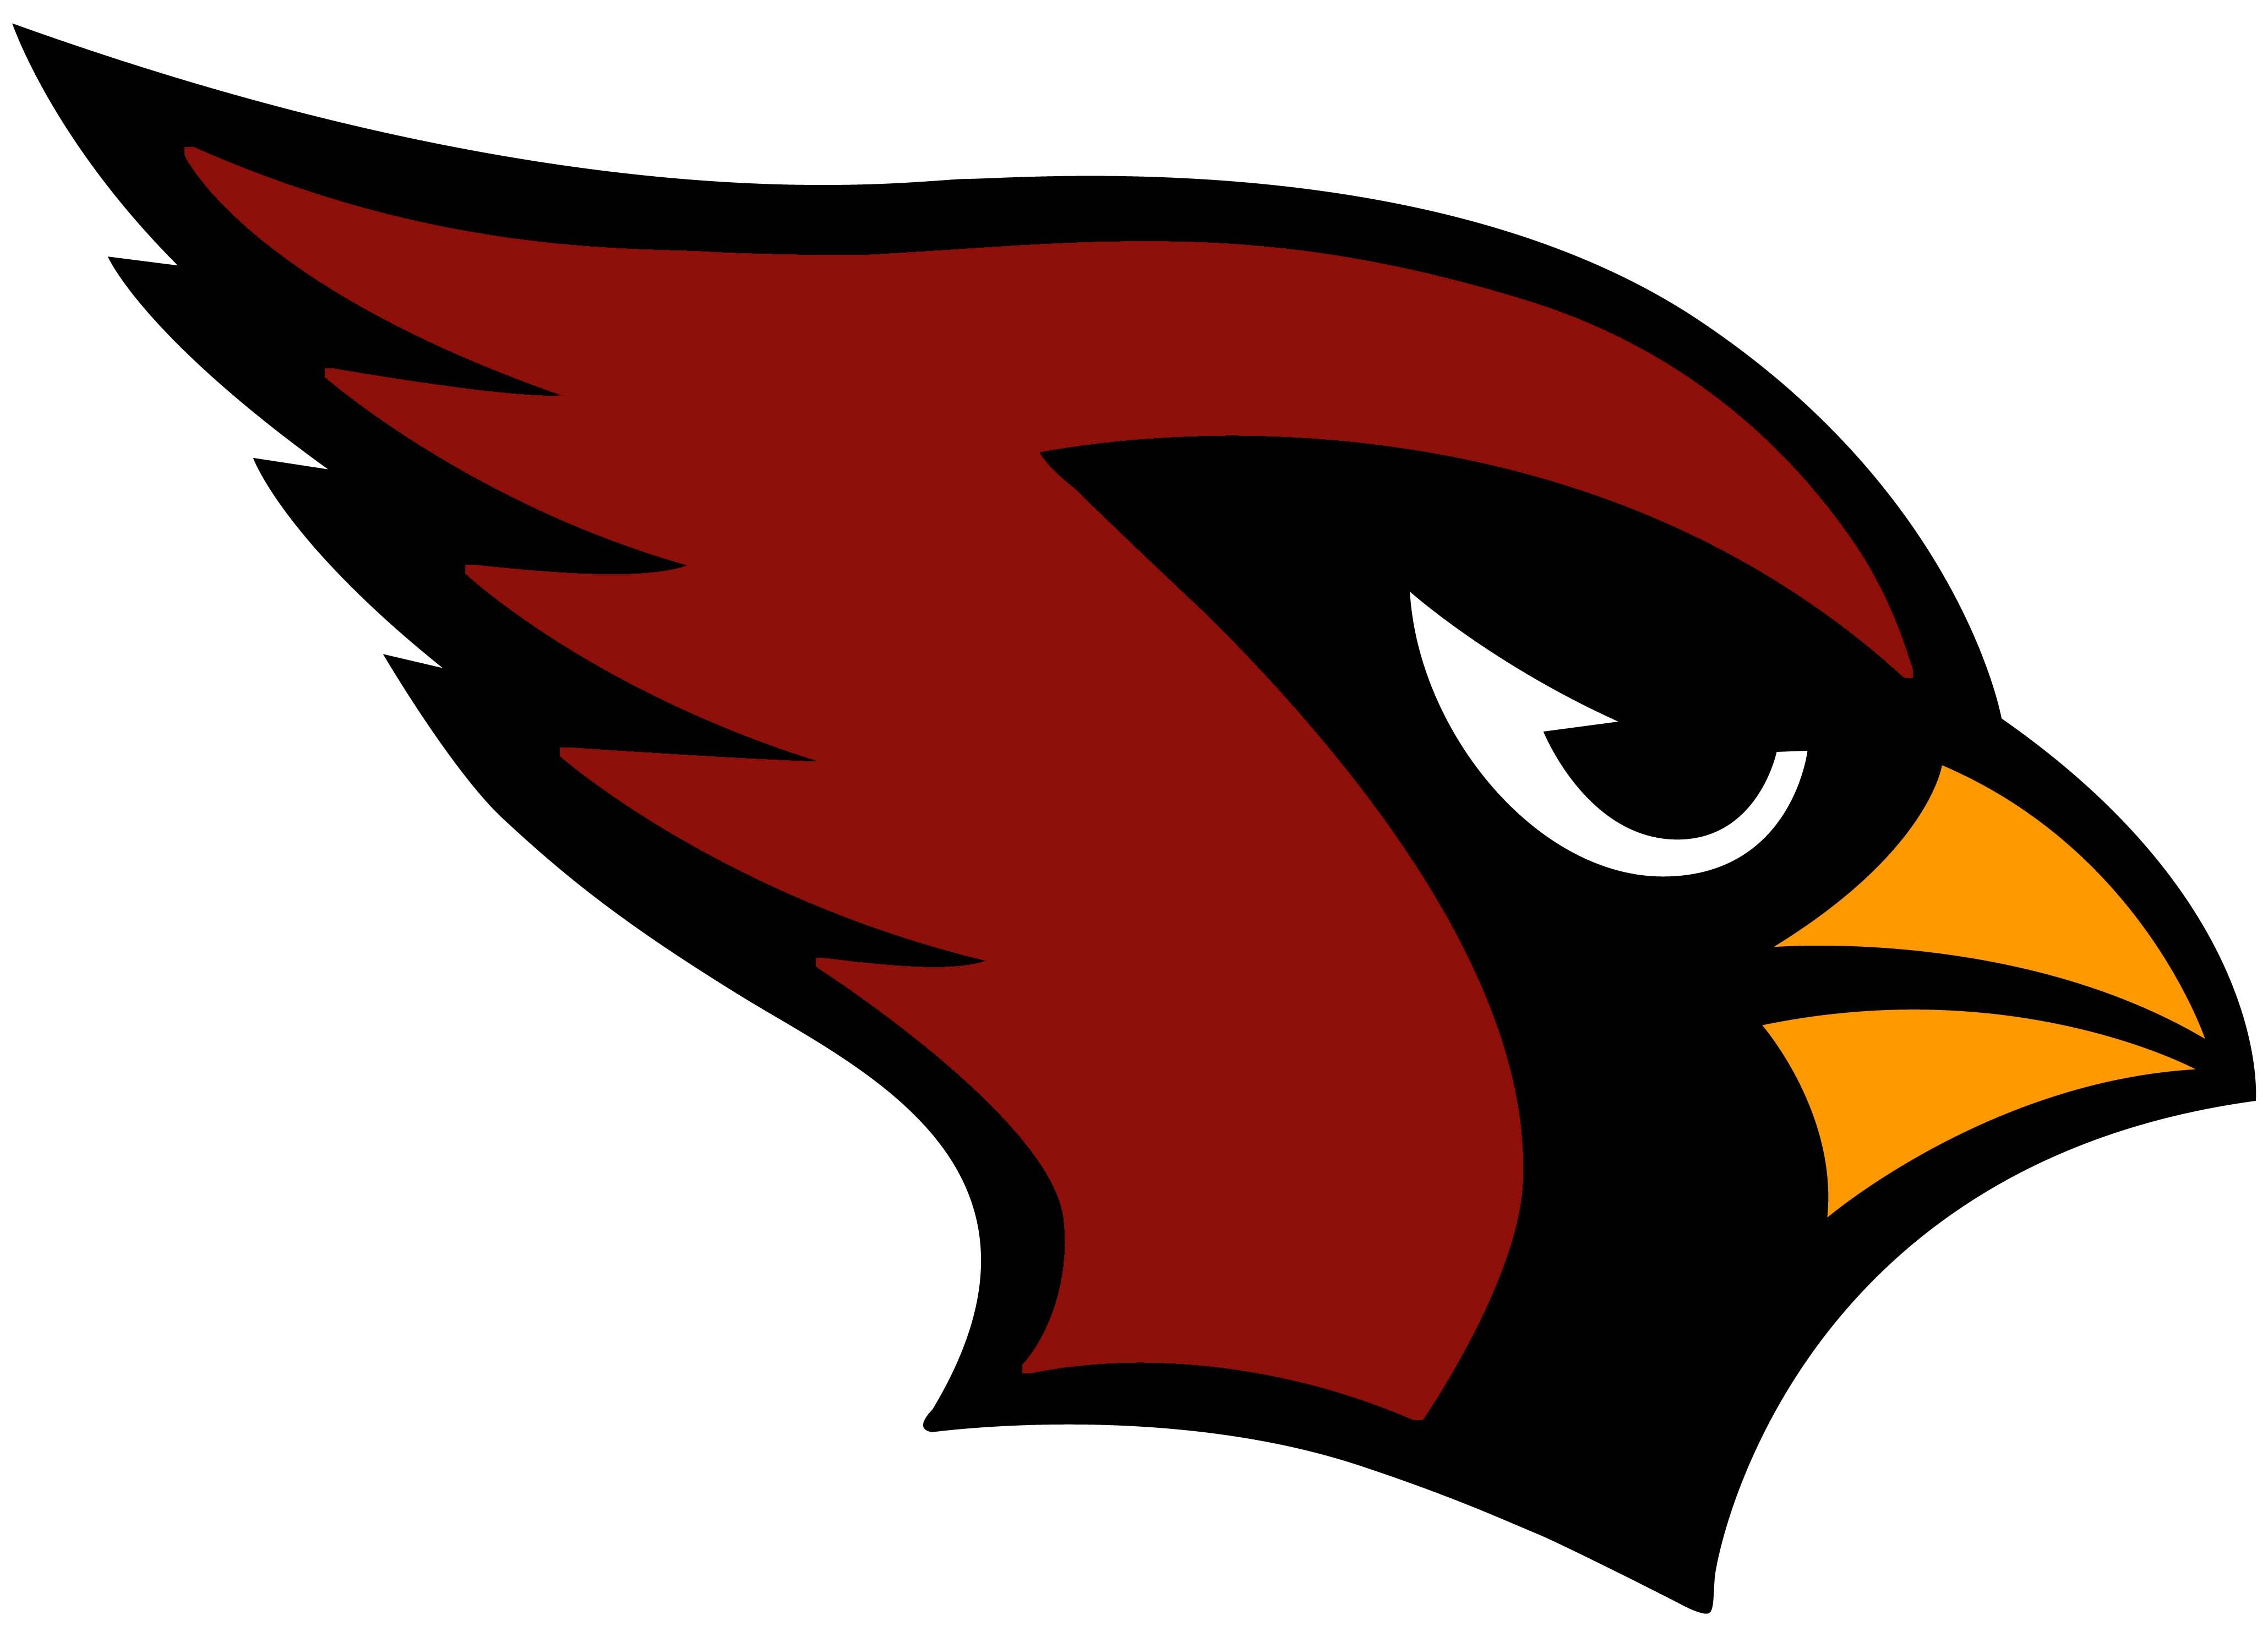 Cardinal clipart south, Cardinal south Transparent FREE for.